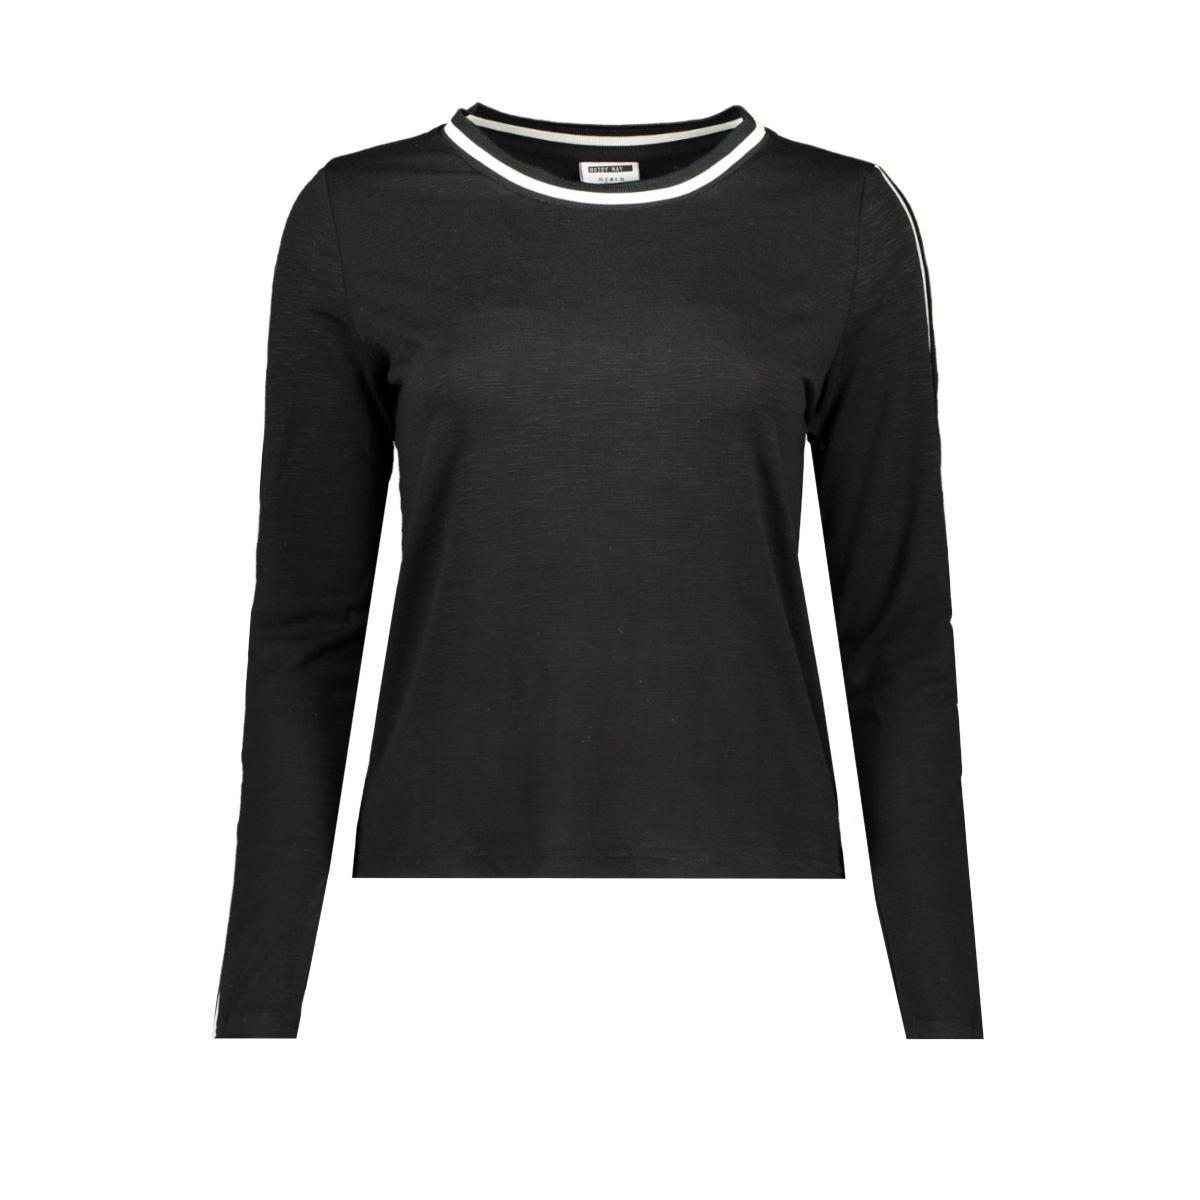 nmmilla  l/s  top x2 27006935 noisy may t-shirt black/ white